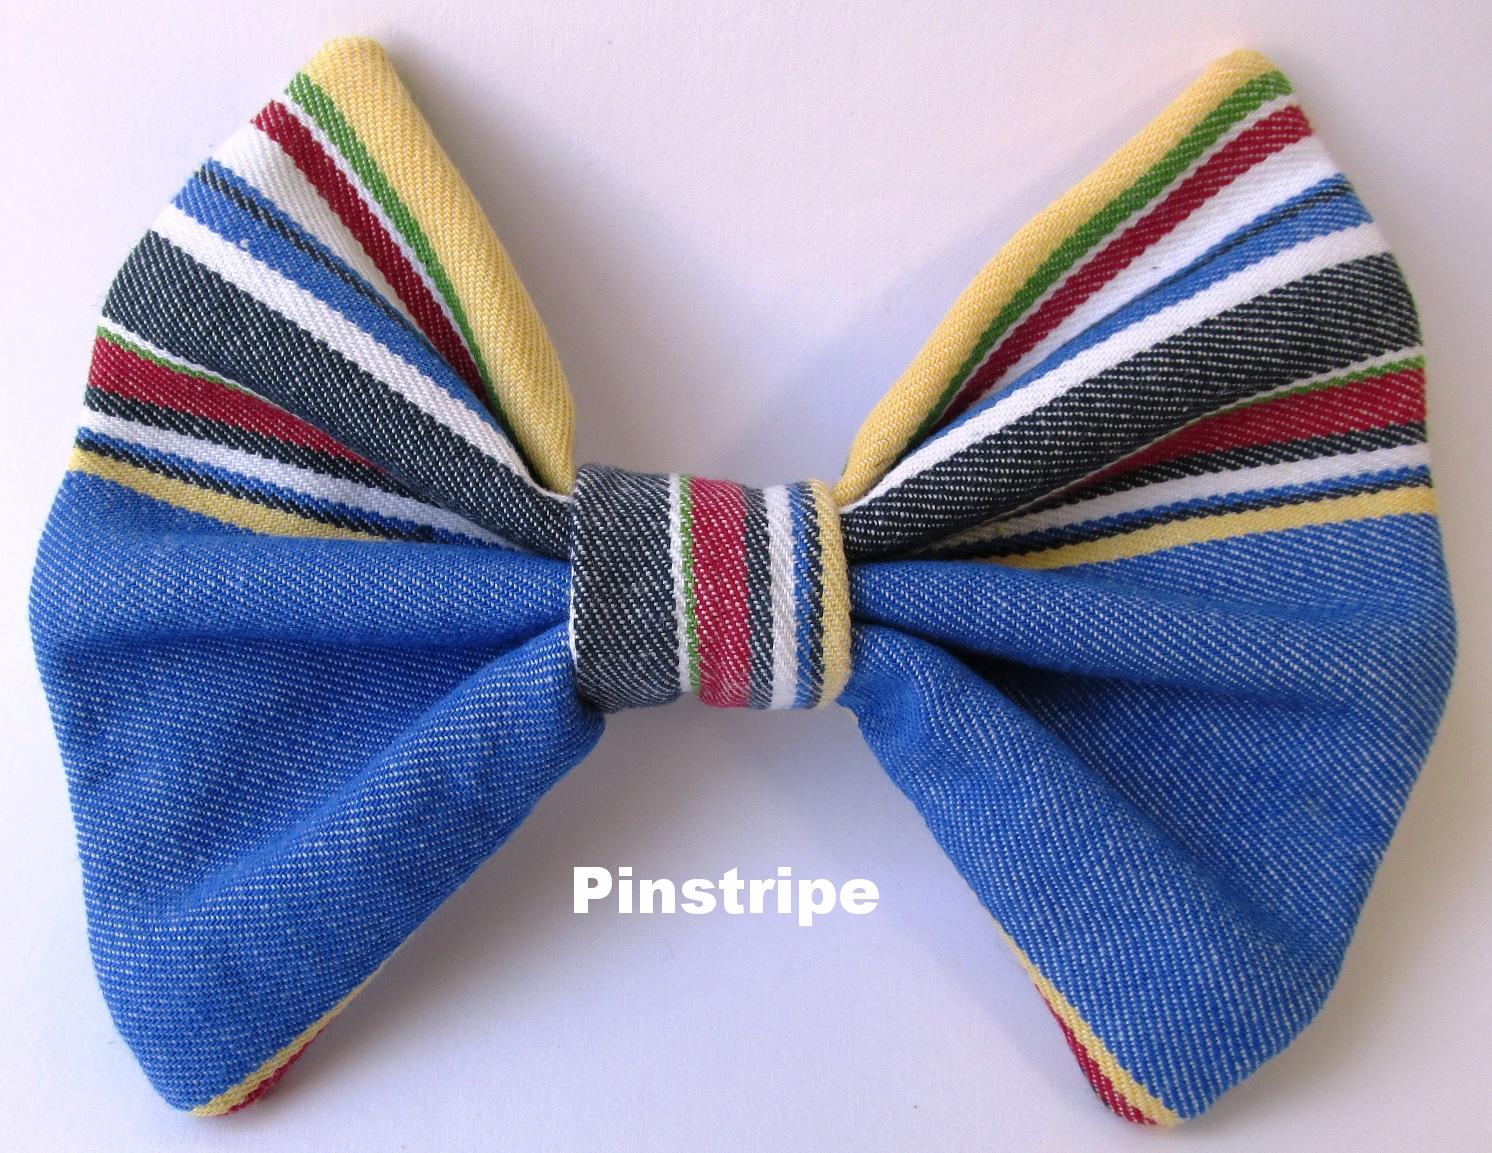 Pinstripe 4514 final.jpg